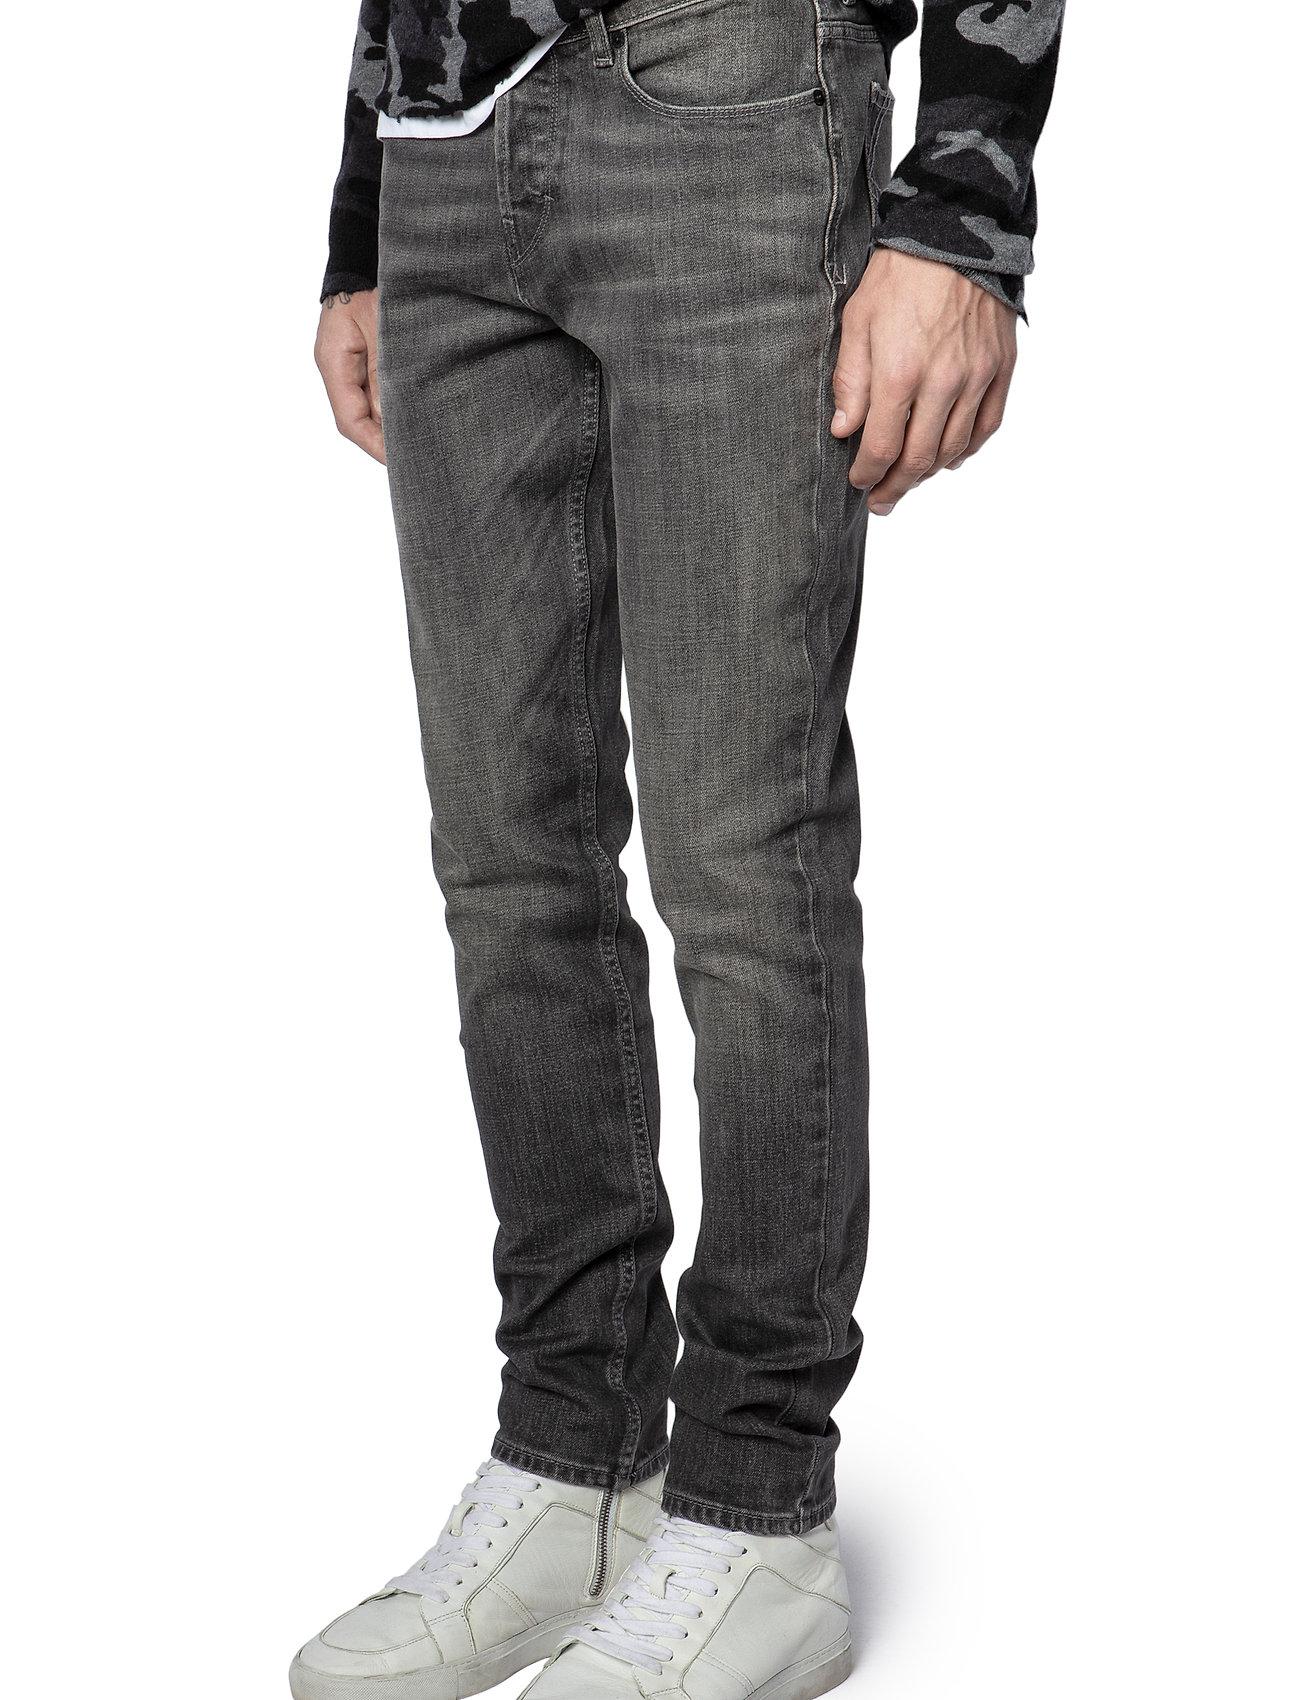 Zadig & Voltaire - DAVID ECO GRIS JEANS - slim jeans - grey - 7